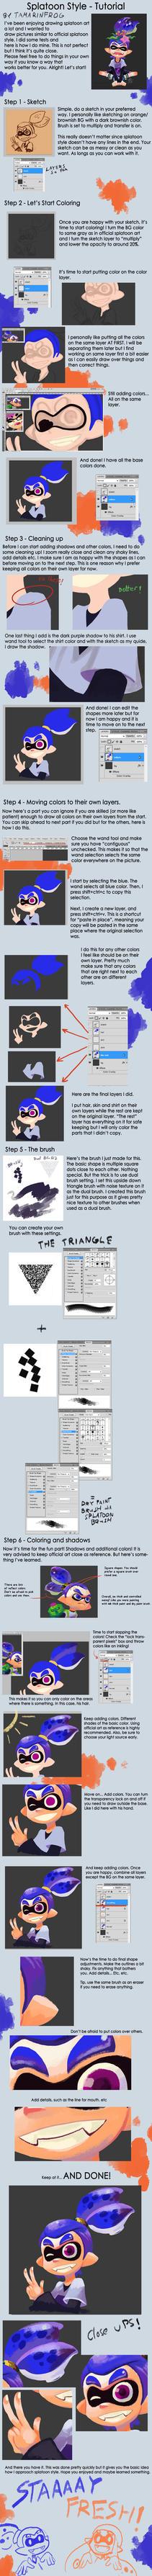 Splatoon Style Tutorial by TamarinFrog